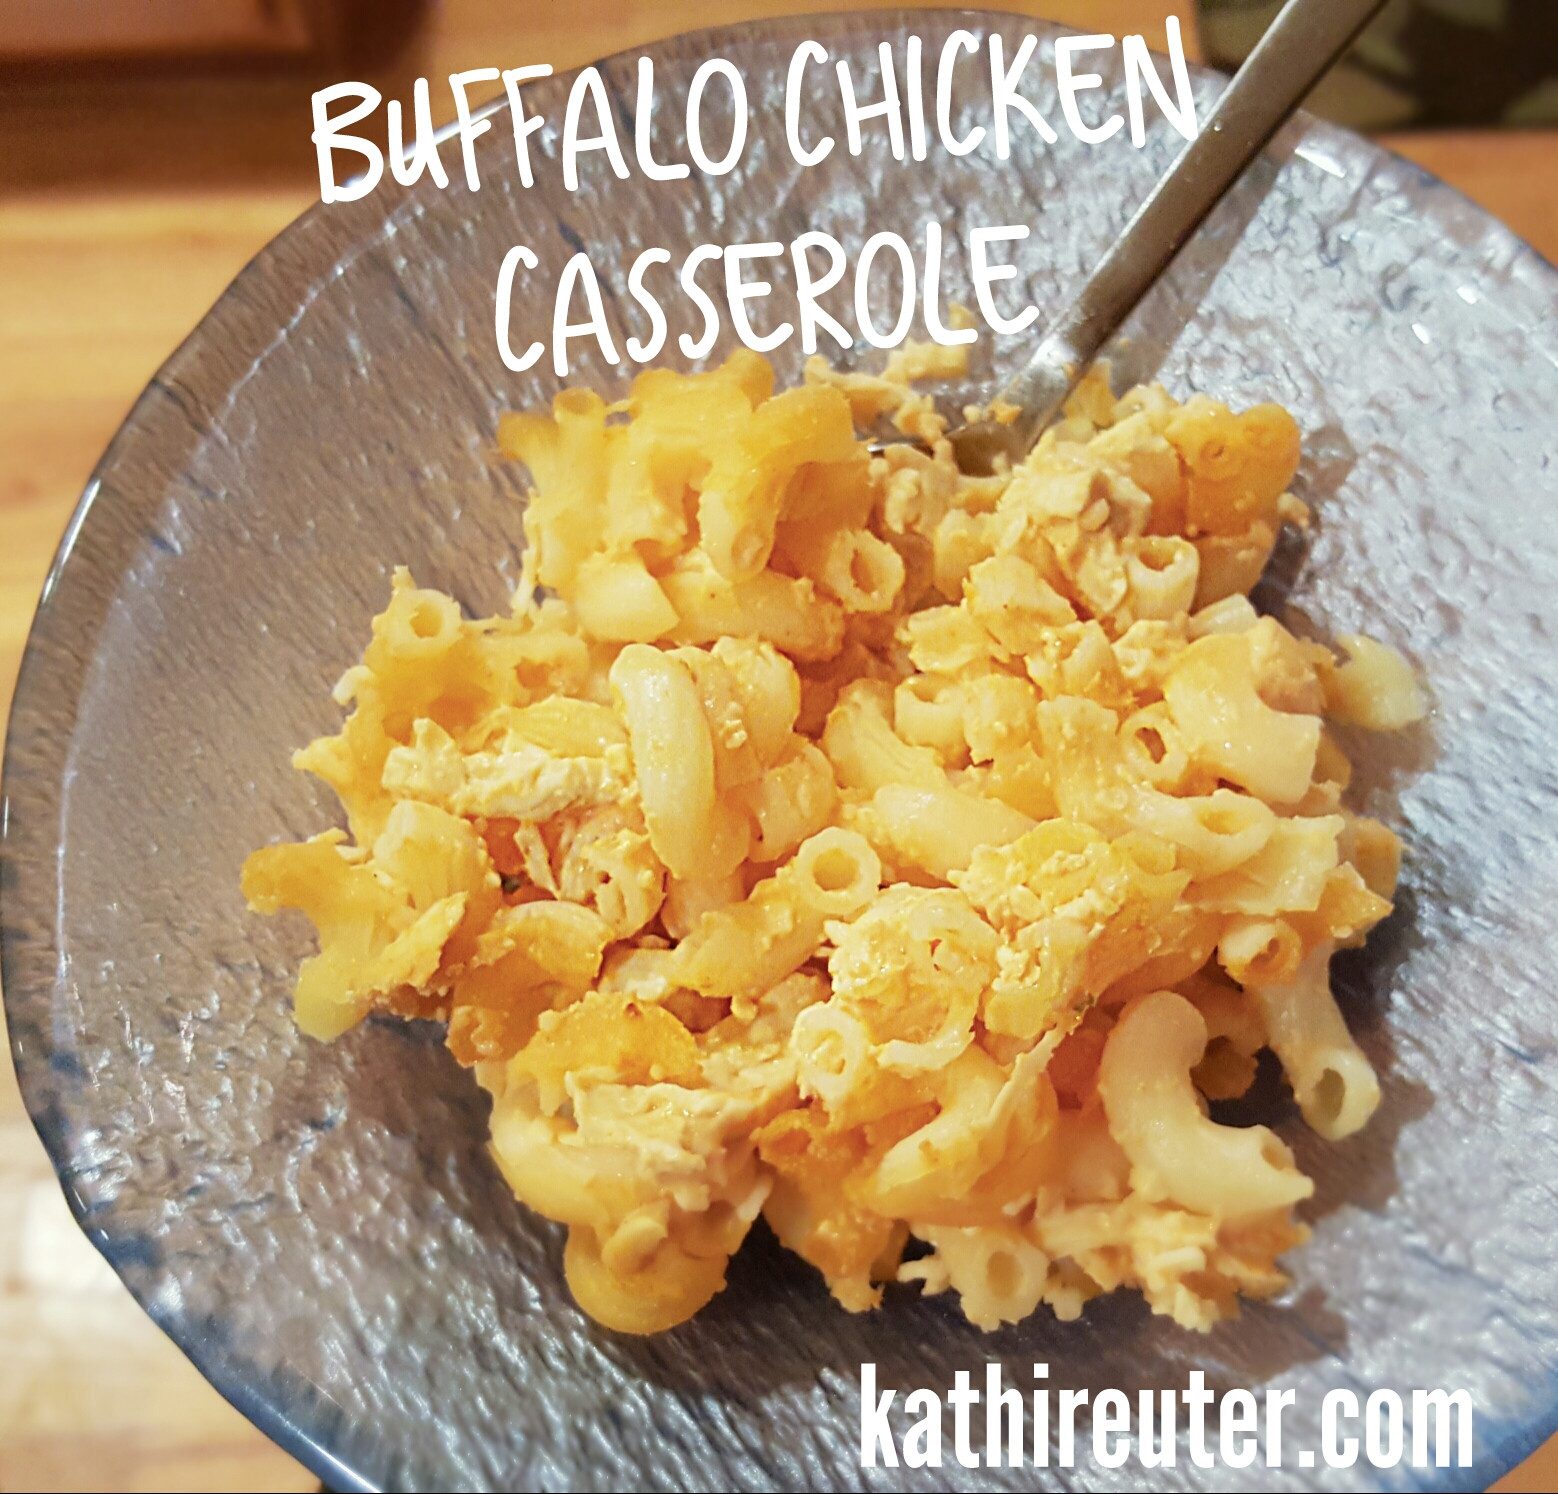 Buffalo Chicken Casserole Healthy  Healthy Buffalo Chicken Casserole